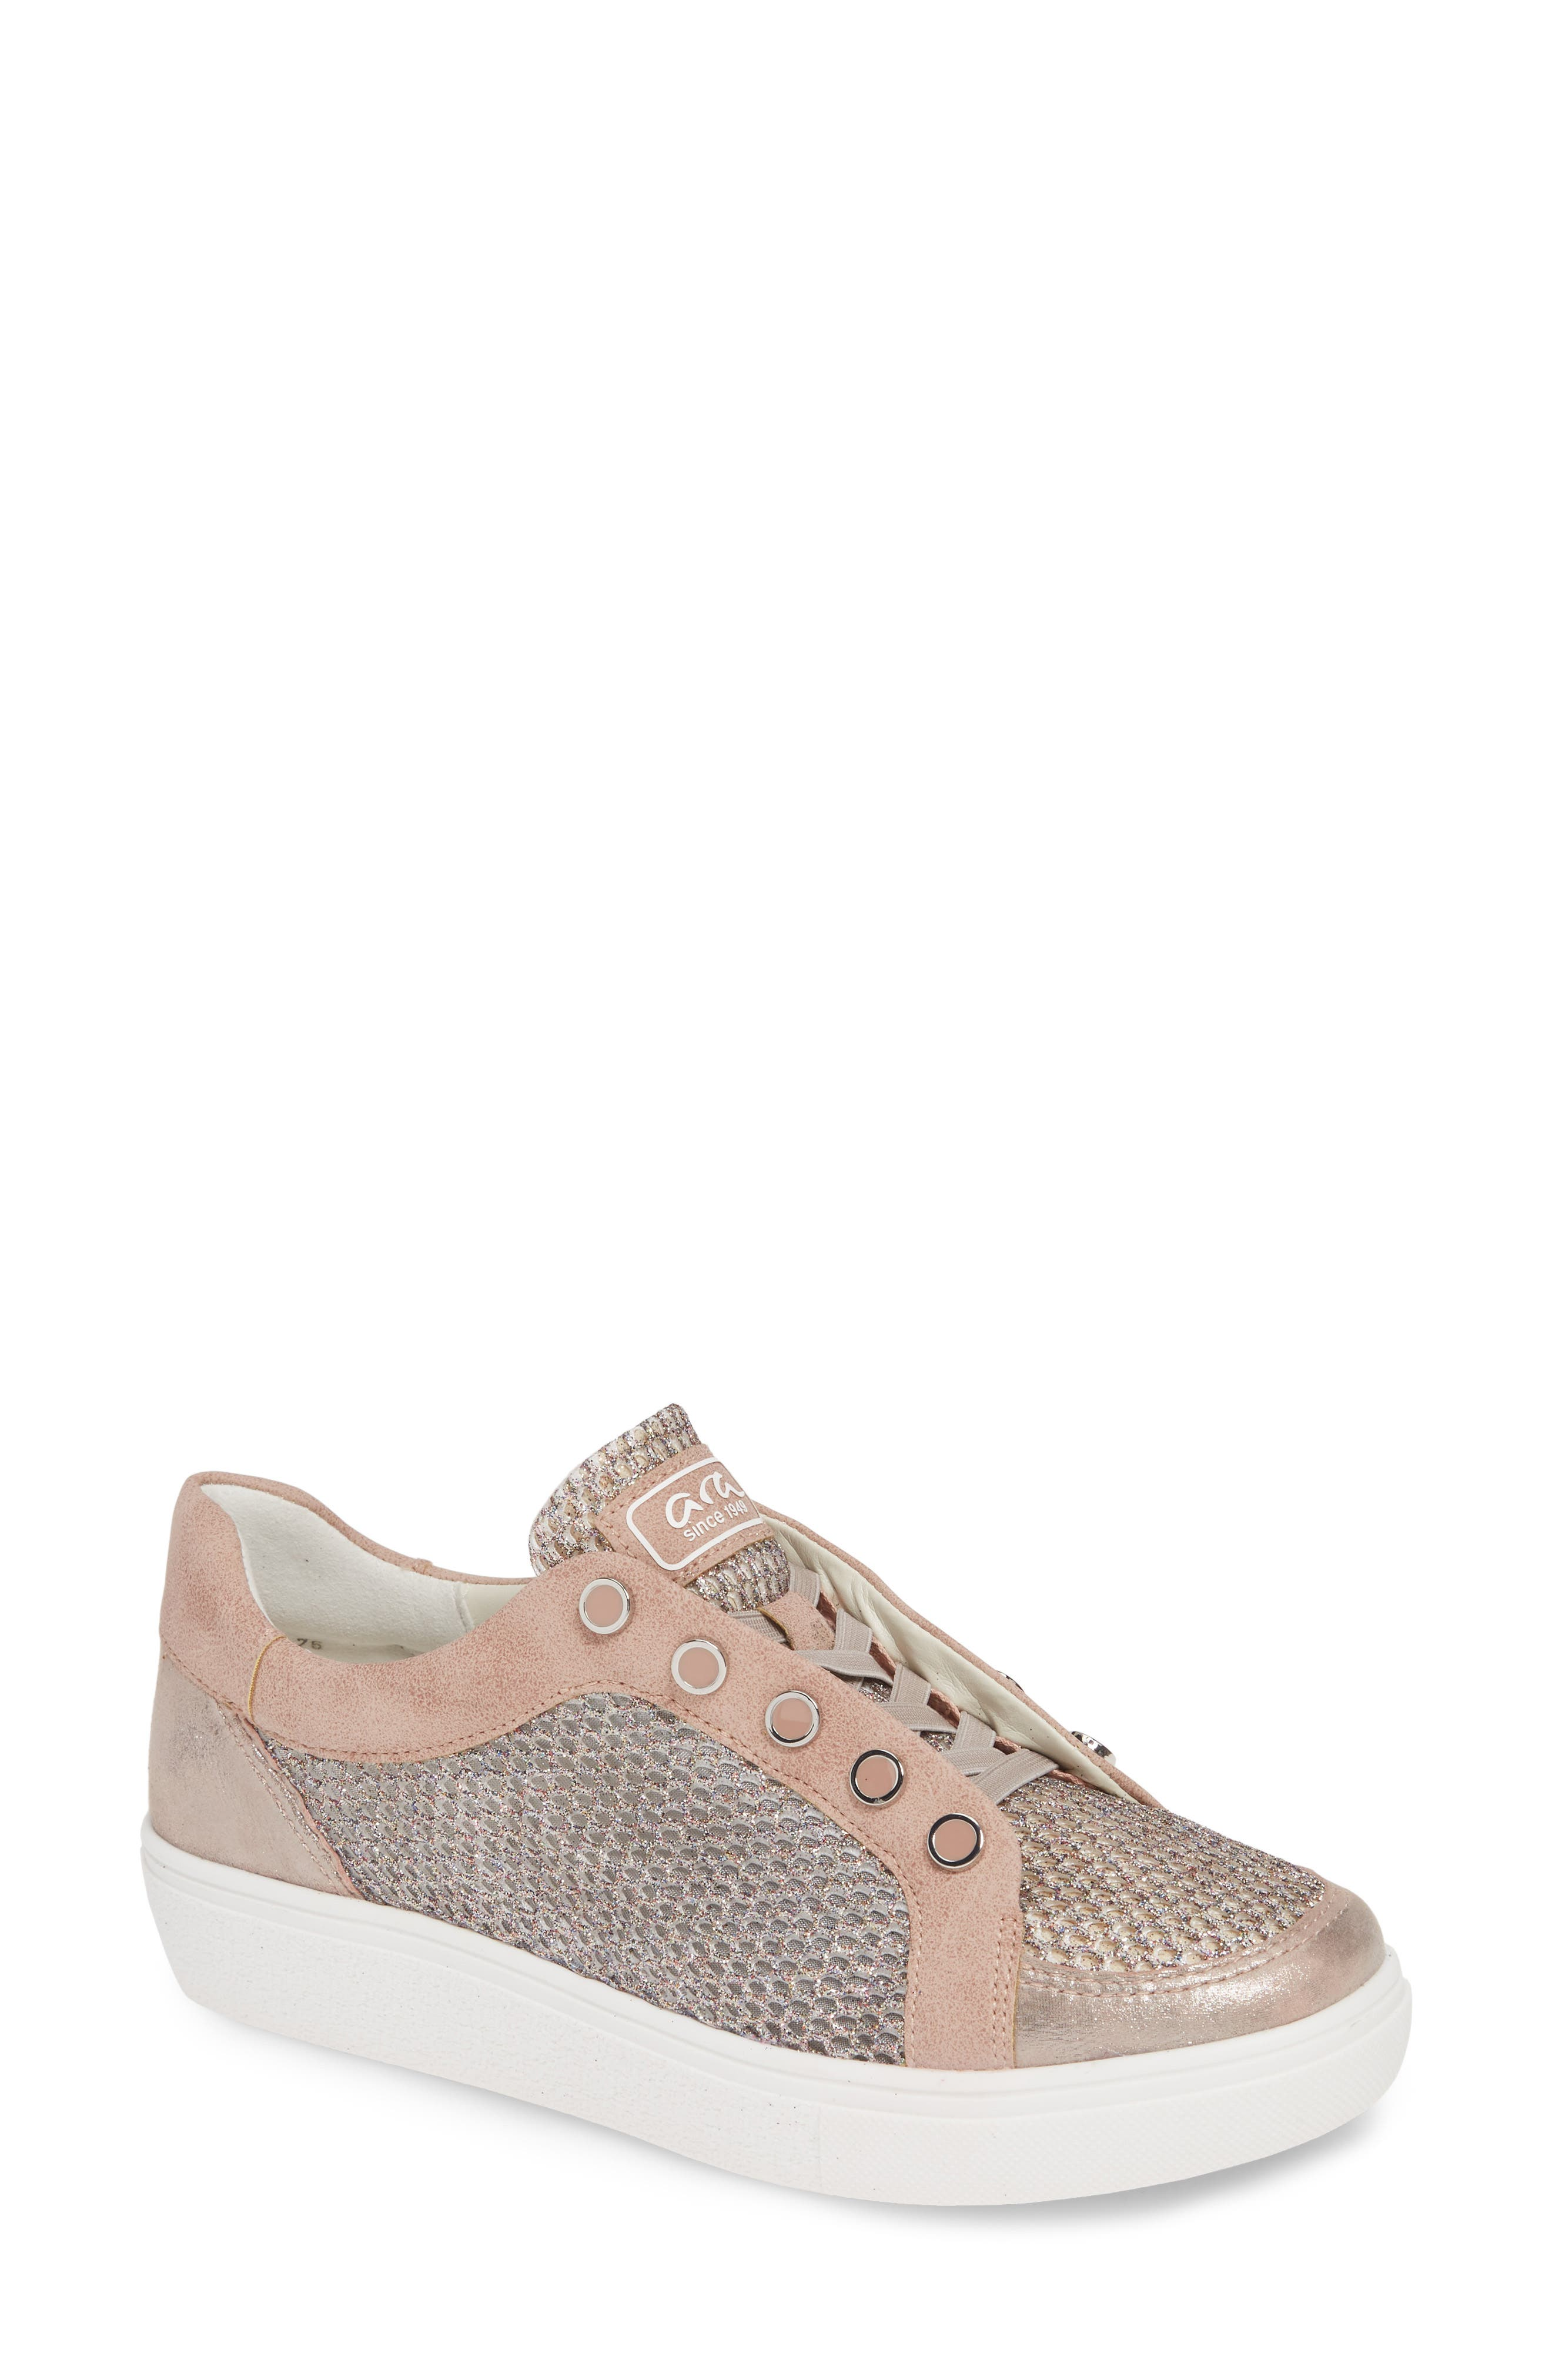 Ara Natasha Slip-On Sneaker- Beige